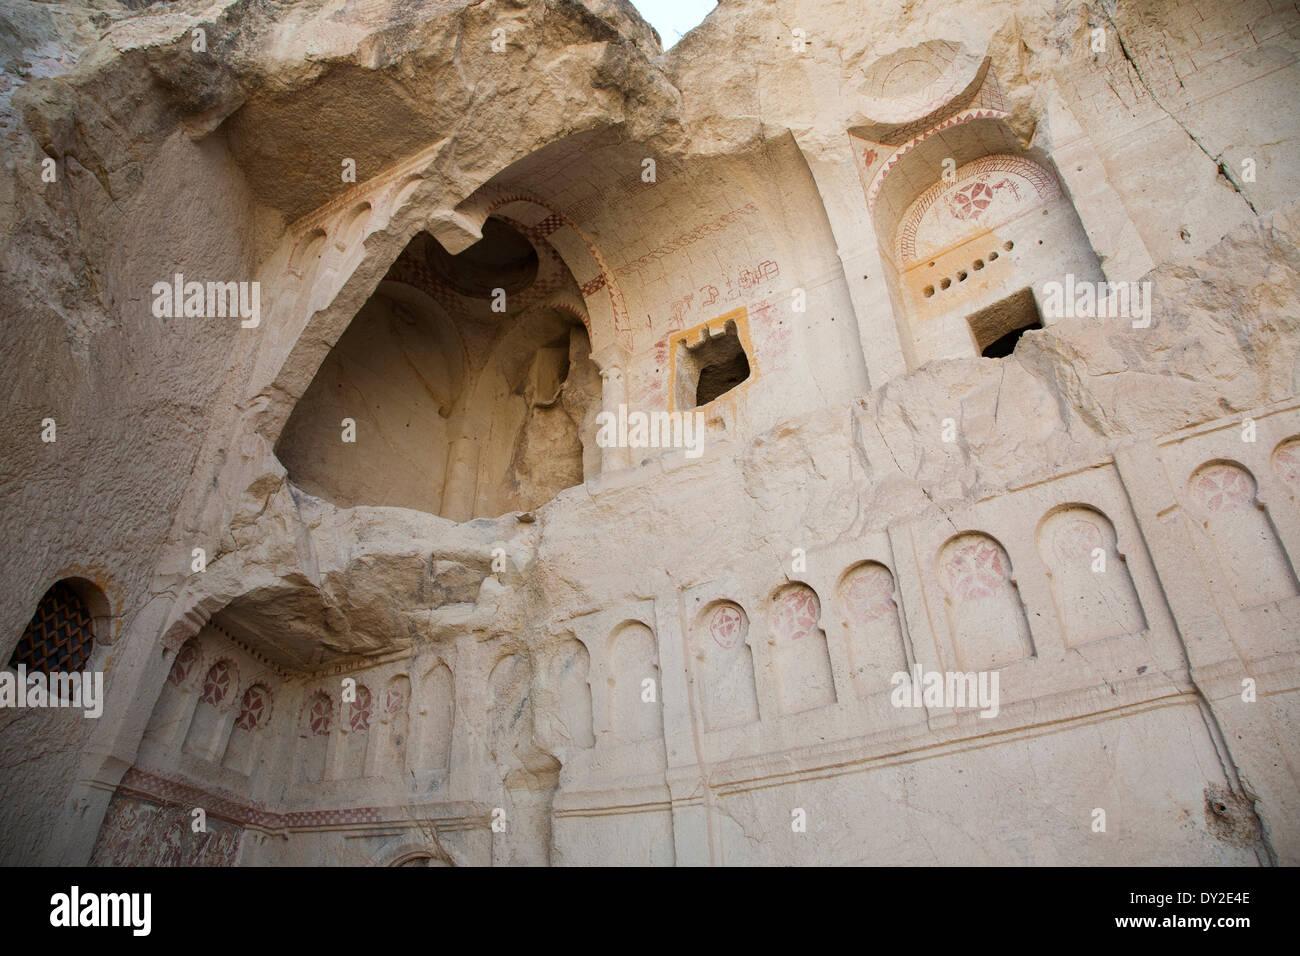 the dark church, open-air museum of goreme, cappadocia, anatolia, turkey, asia Stock Photo